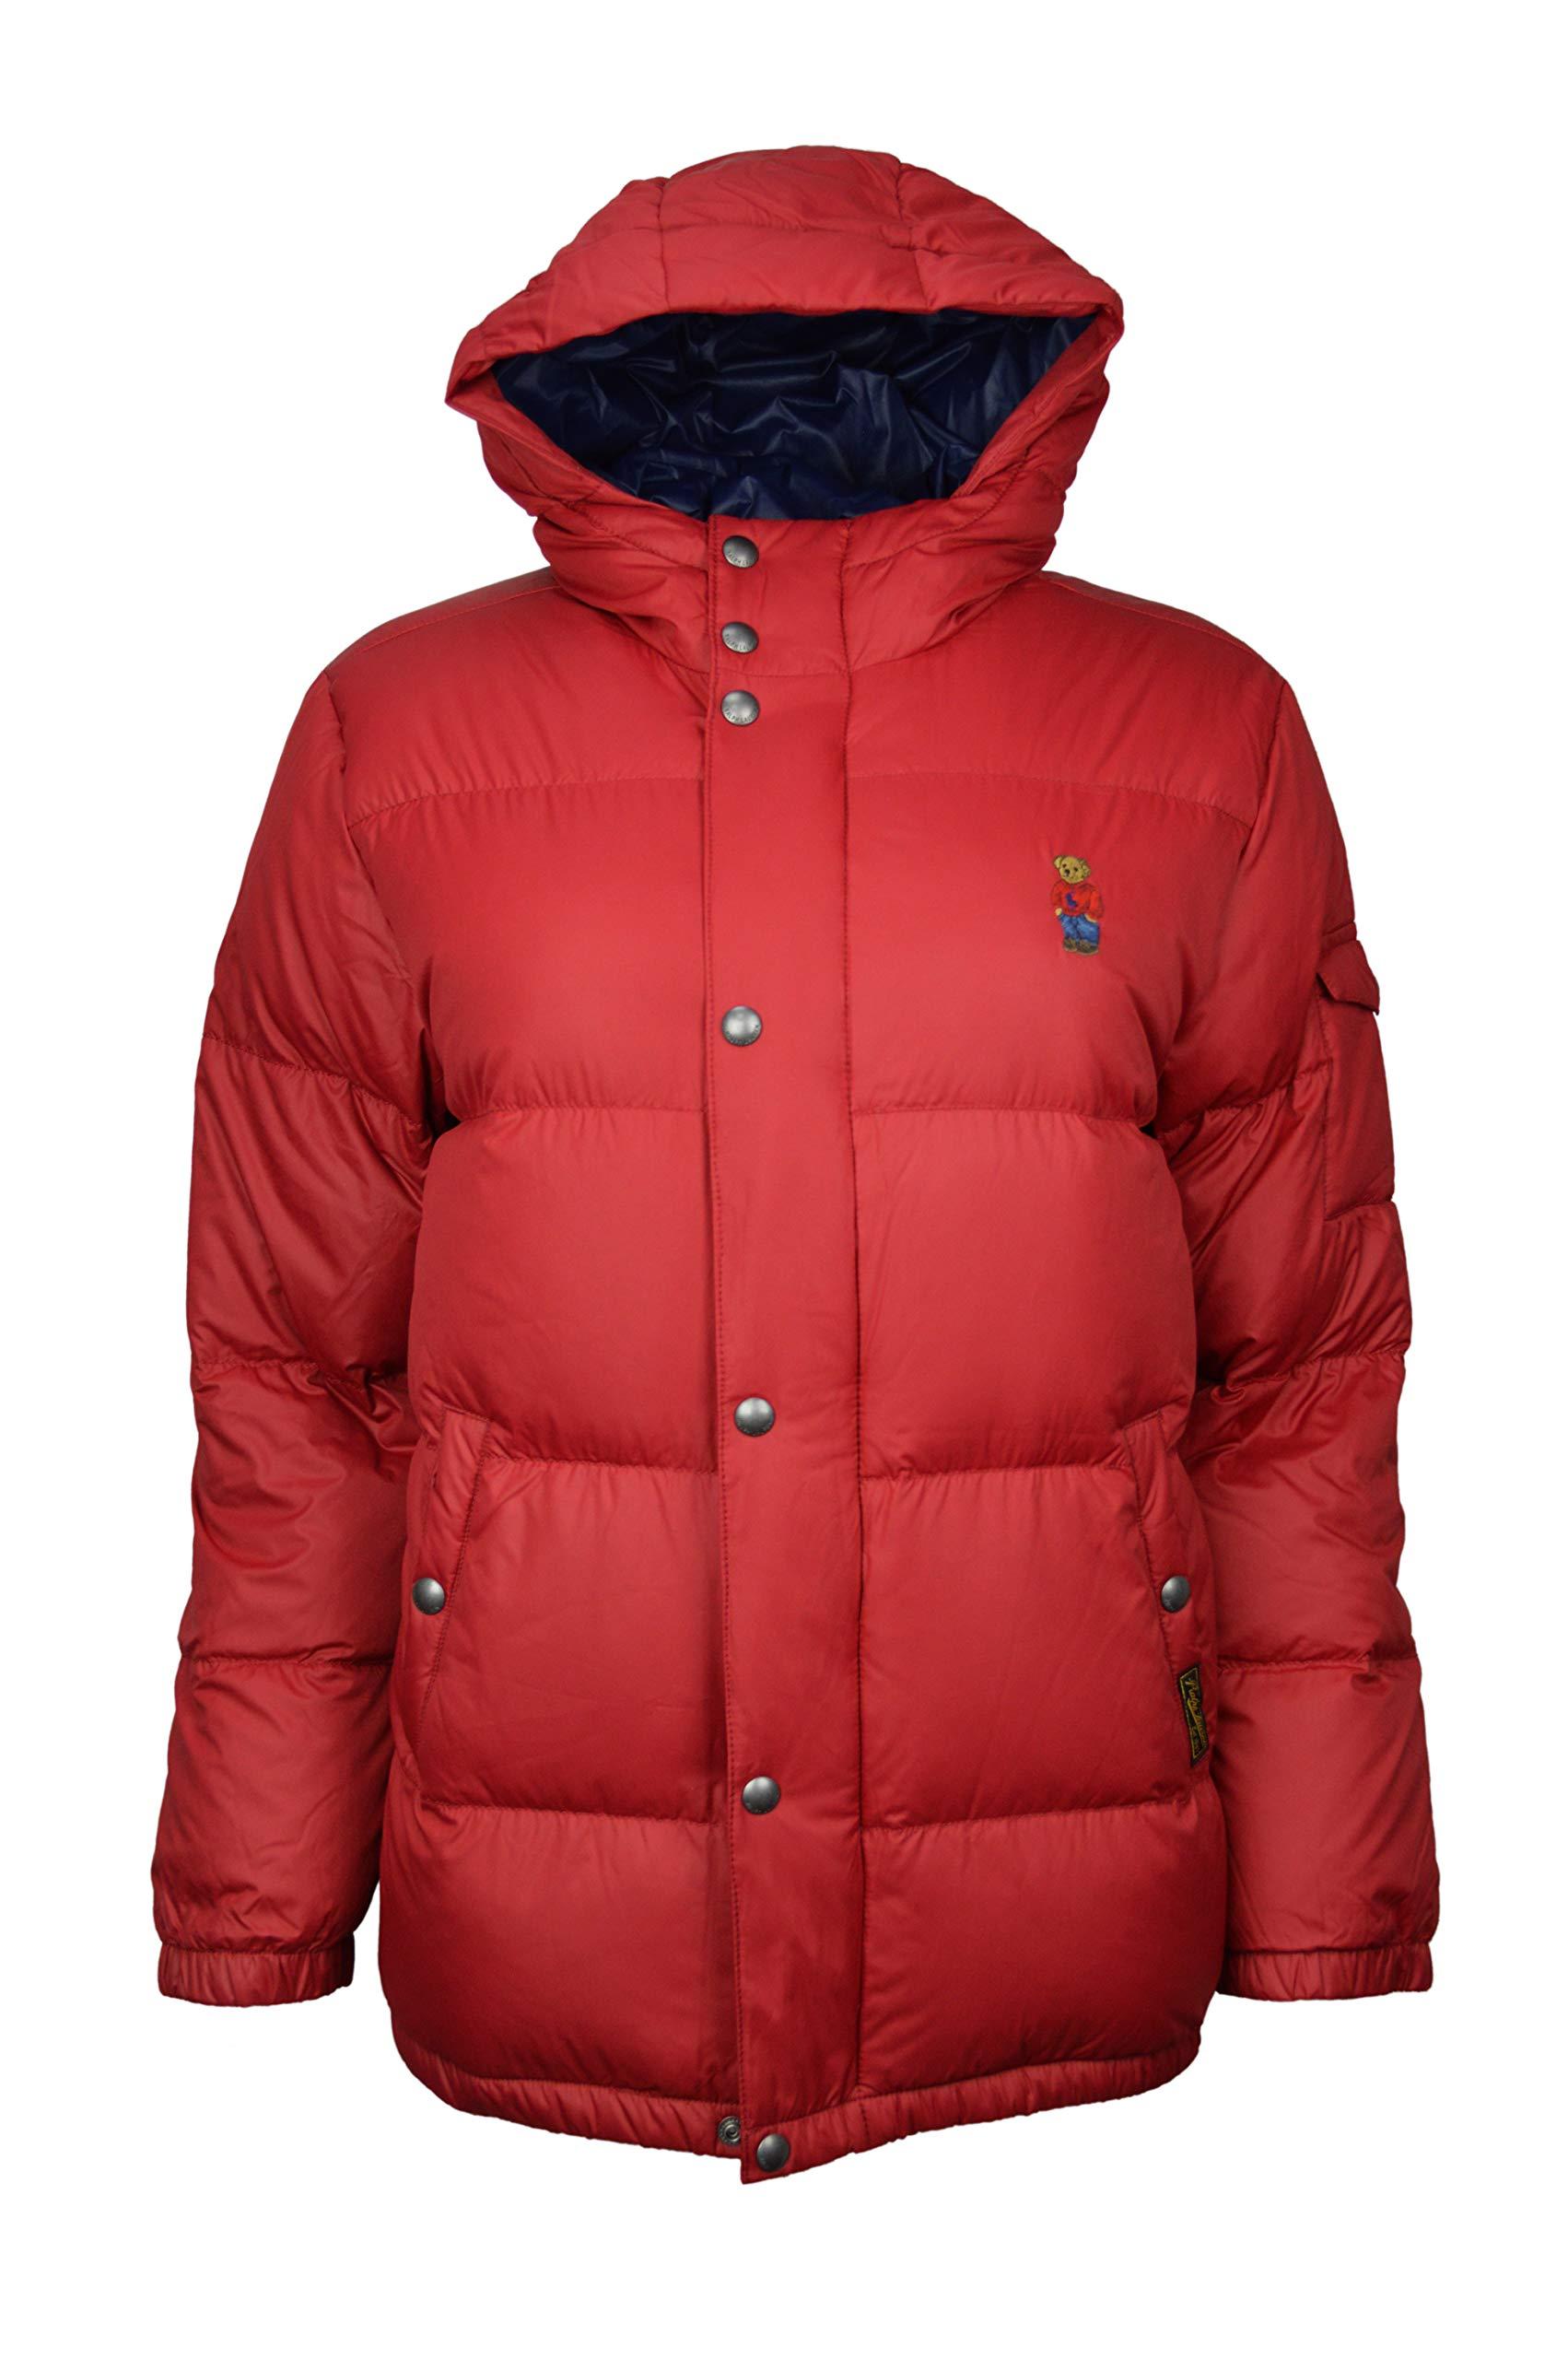 Polo Ralph Lauren Kids Snap Button Full Zip Hooded Puffer Jacket Coat RL Red Small (8)